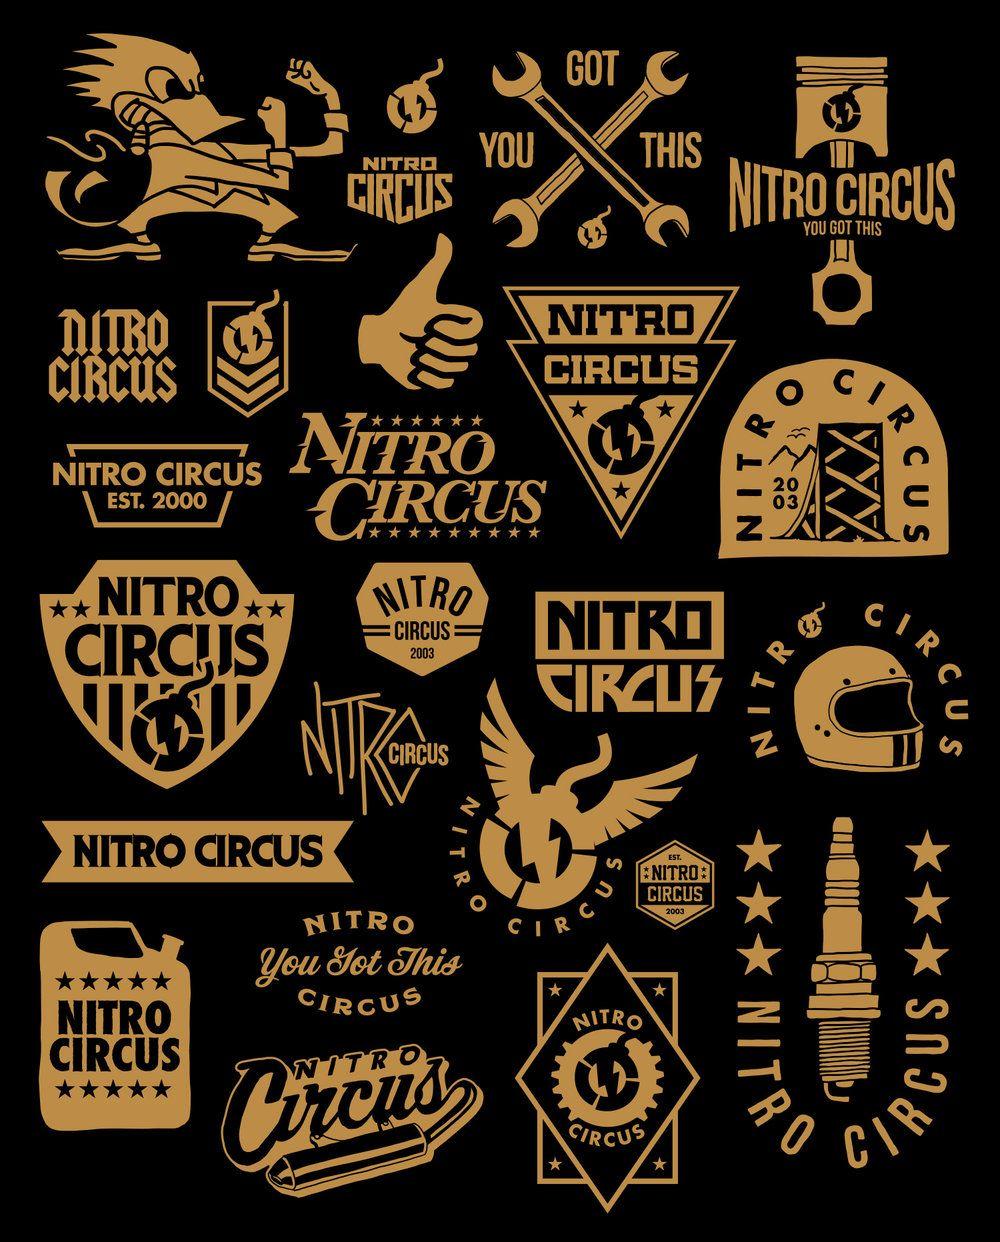 nitro_badge3.jpg Nitro circus, Badge design, Retro logos